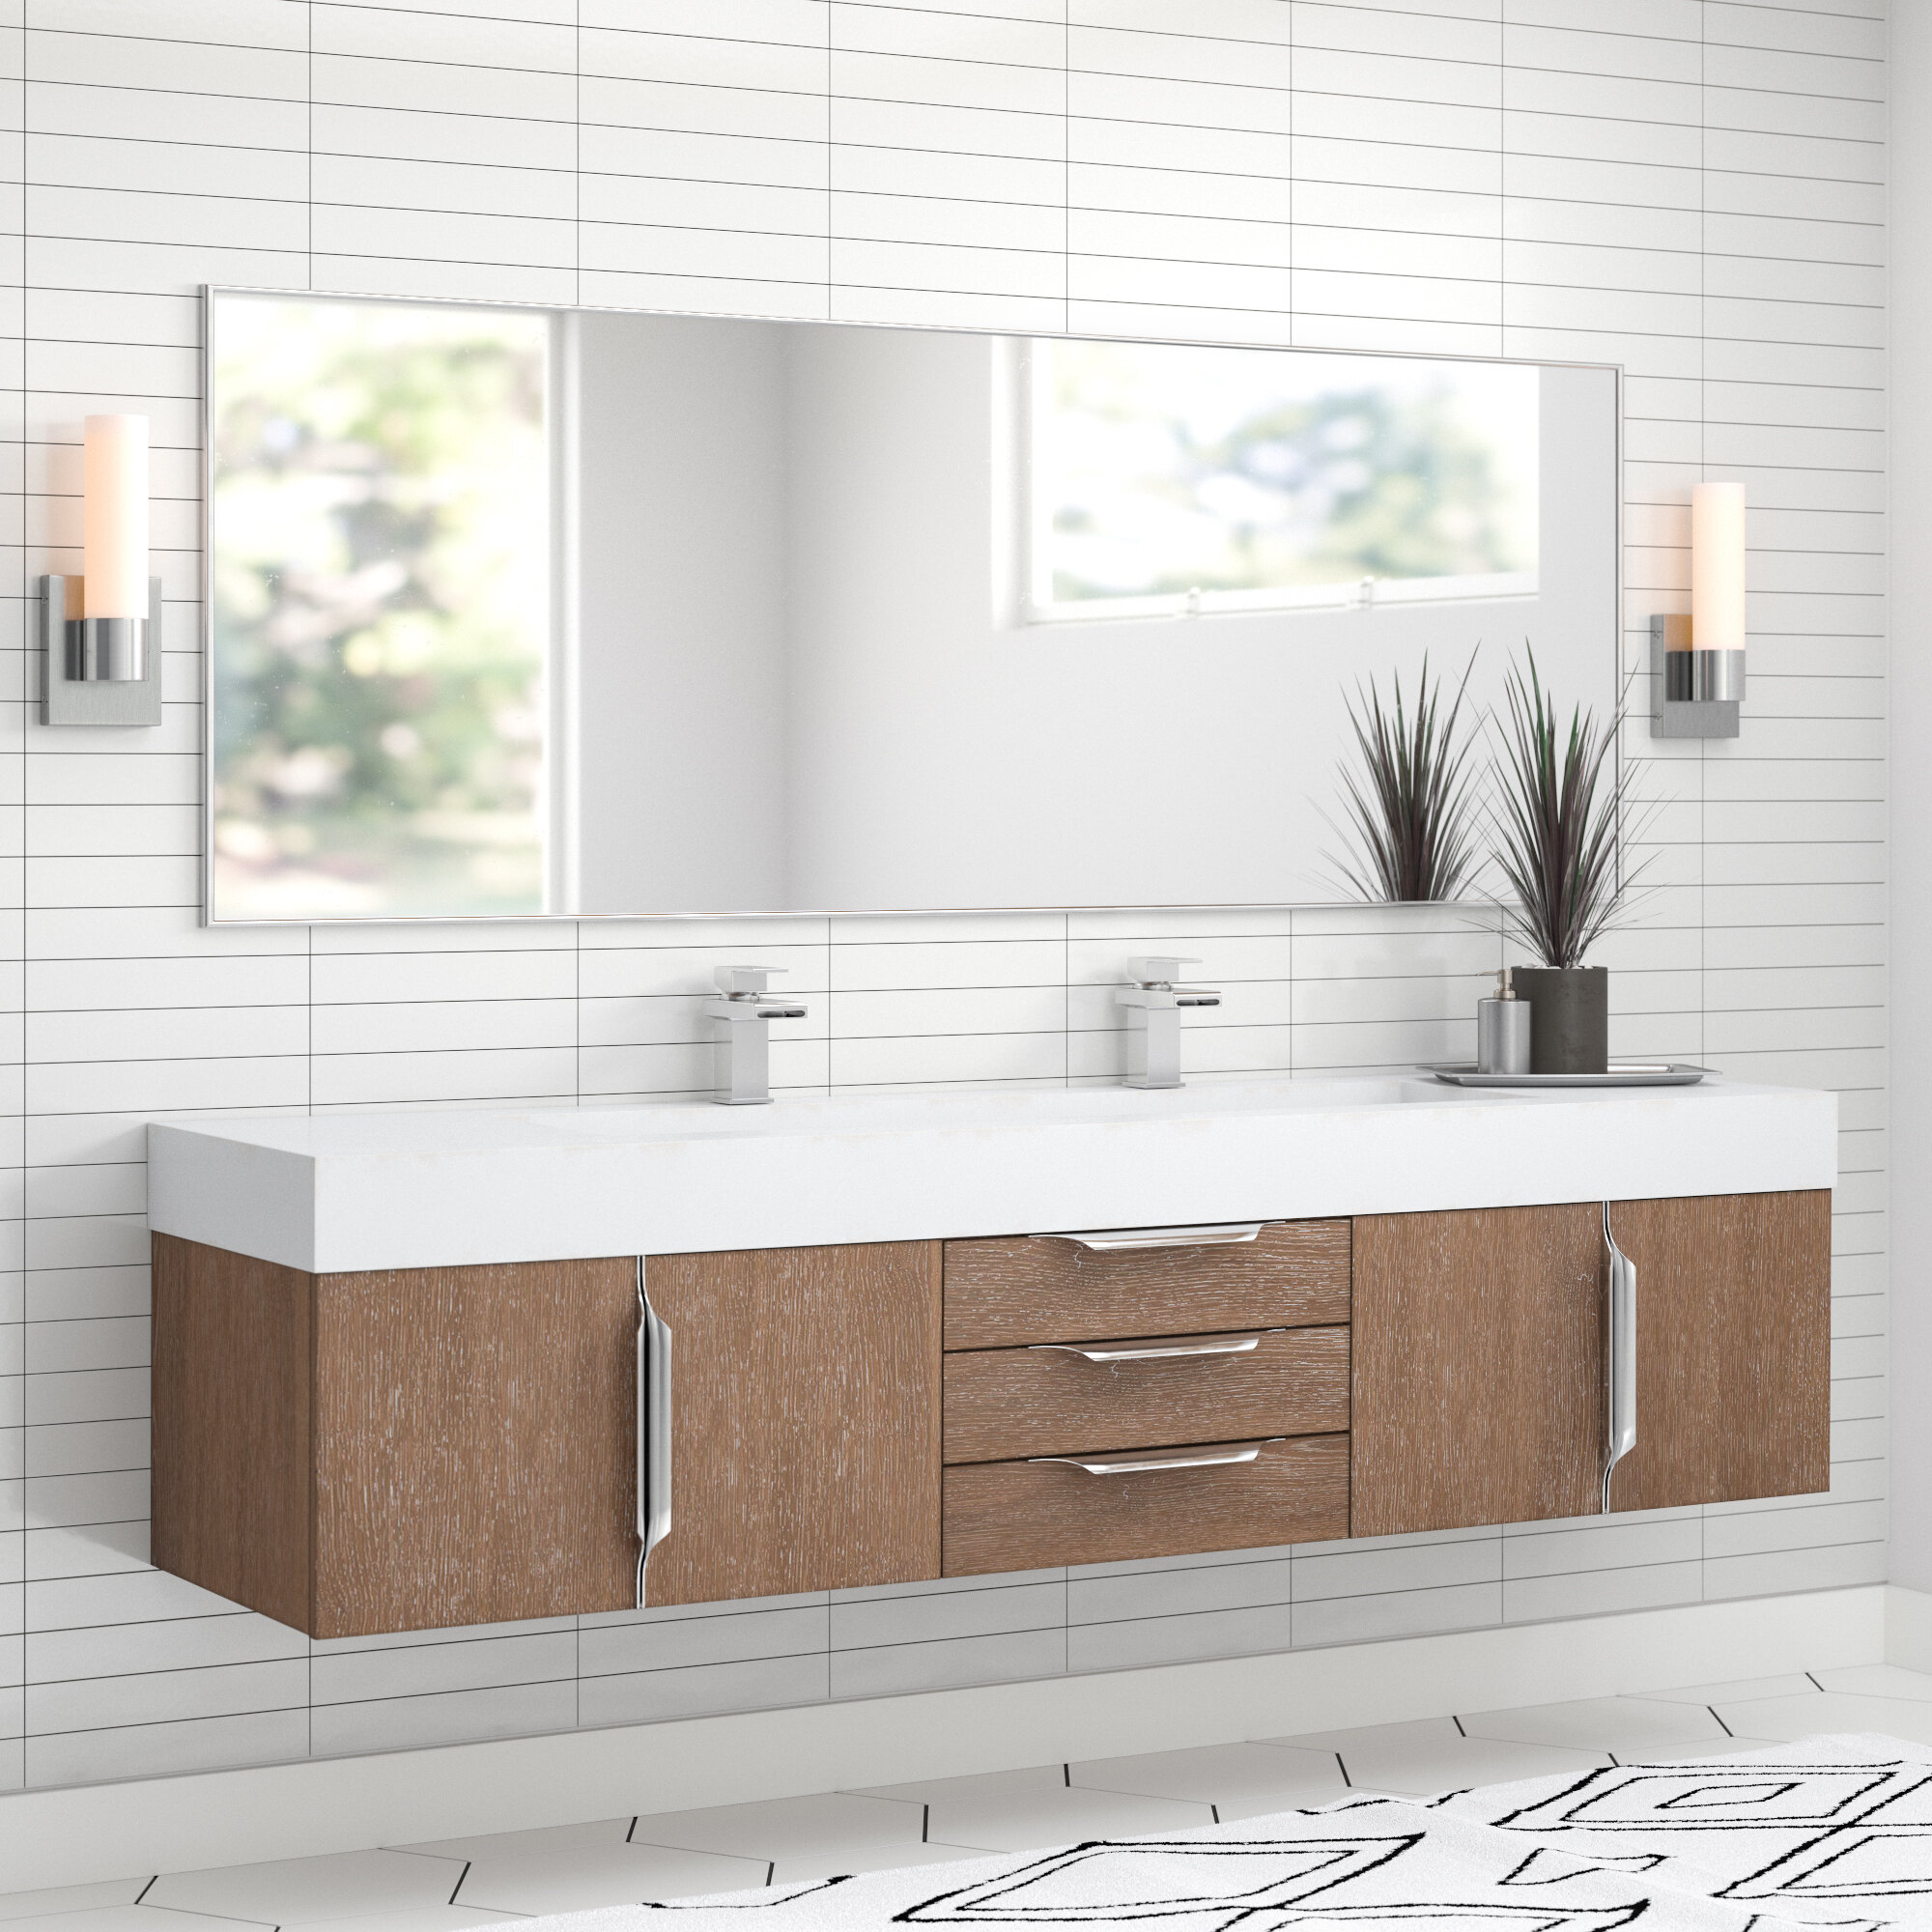 Allmodern Hukill 73 Wall Mounted Double Bathroom Vanity Set Reviews Wayfair